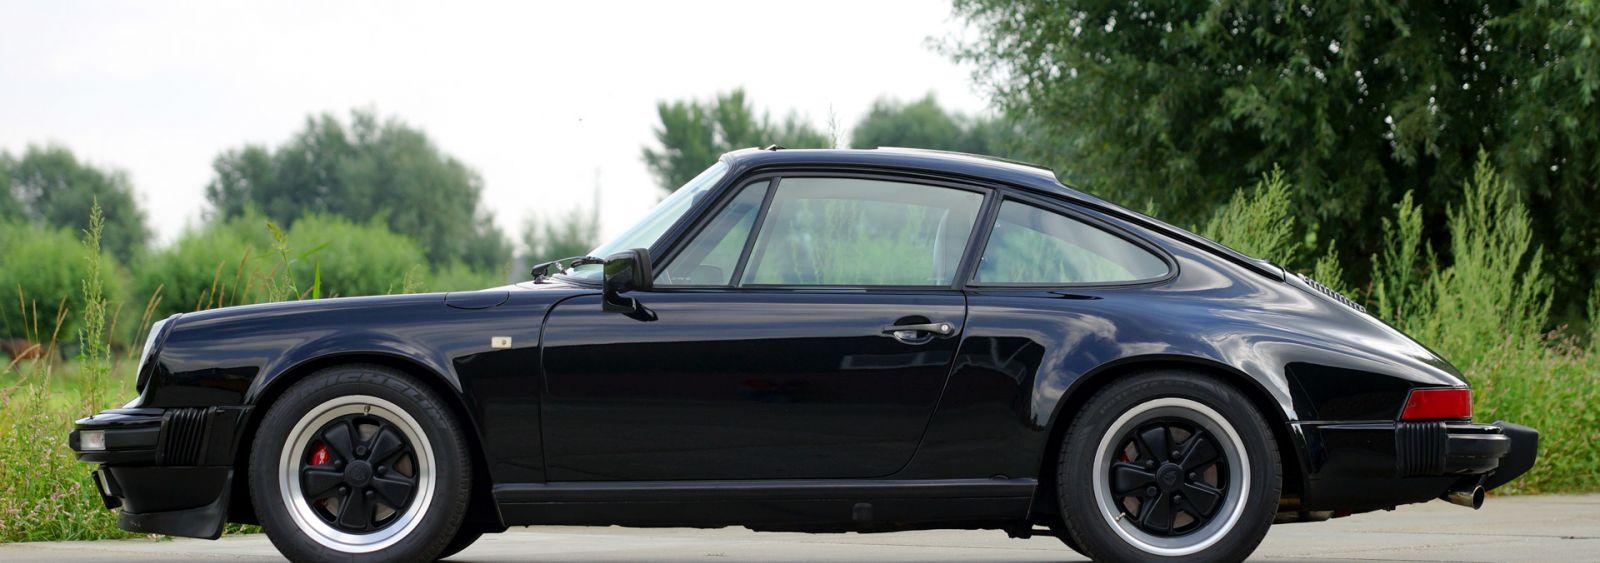 porsche 911 carrera 3 2 1984 classicargarage fr. Black Bedroom Furniture Sets. Home Design Ideas